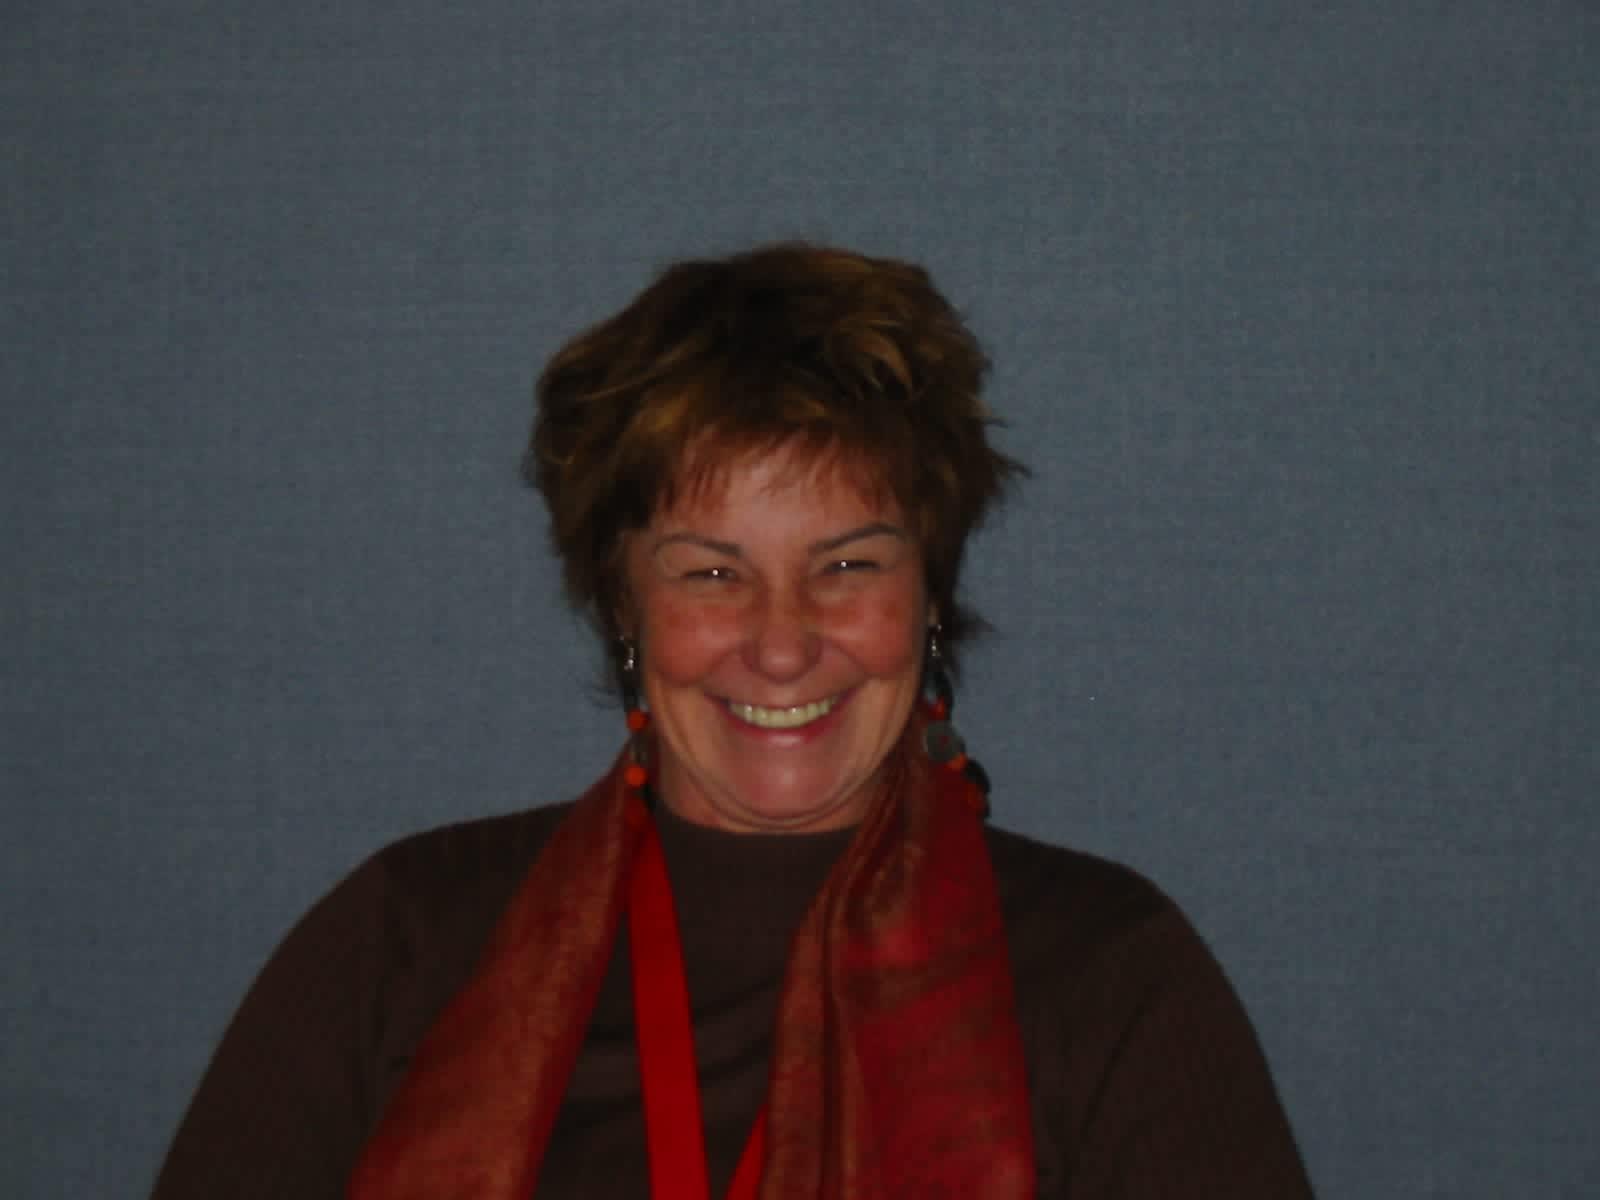 Sue-anne from Adelaide, South Australia, Australia